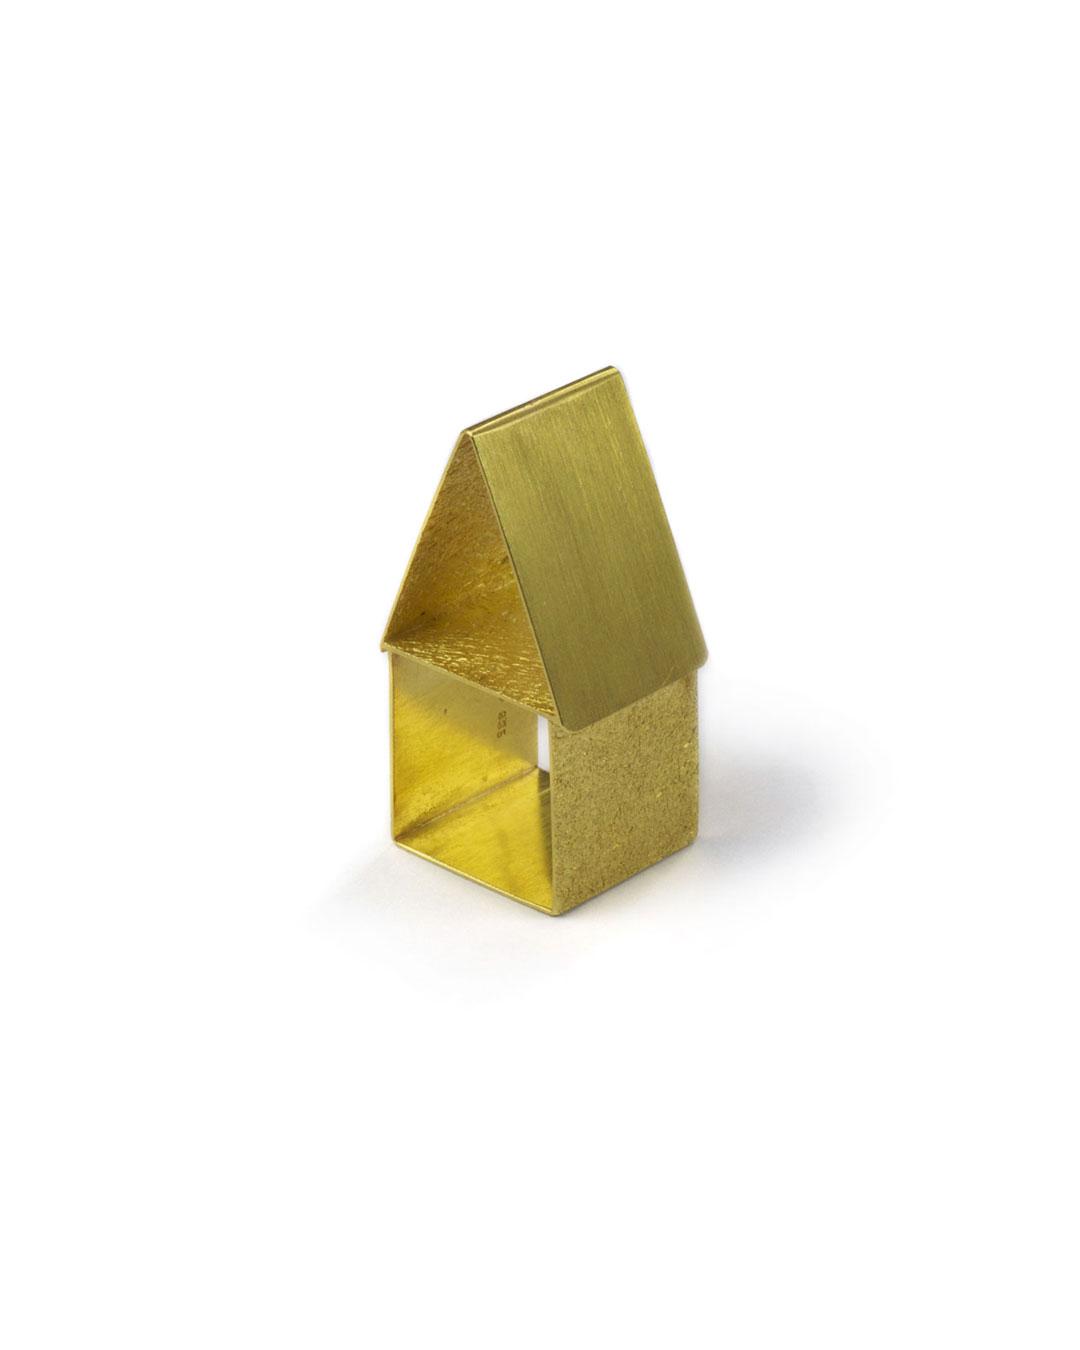 Okinari Kurokawa, untitled, 2004, ring; 20ct gold, 40 x 21 x 18 mm, €2700